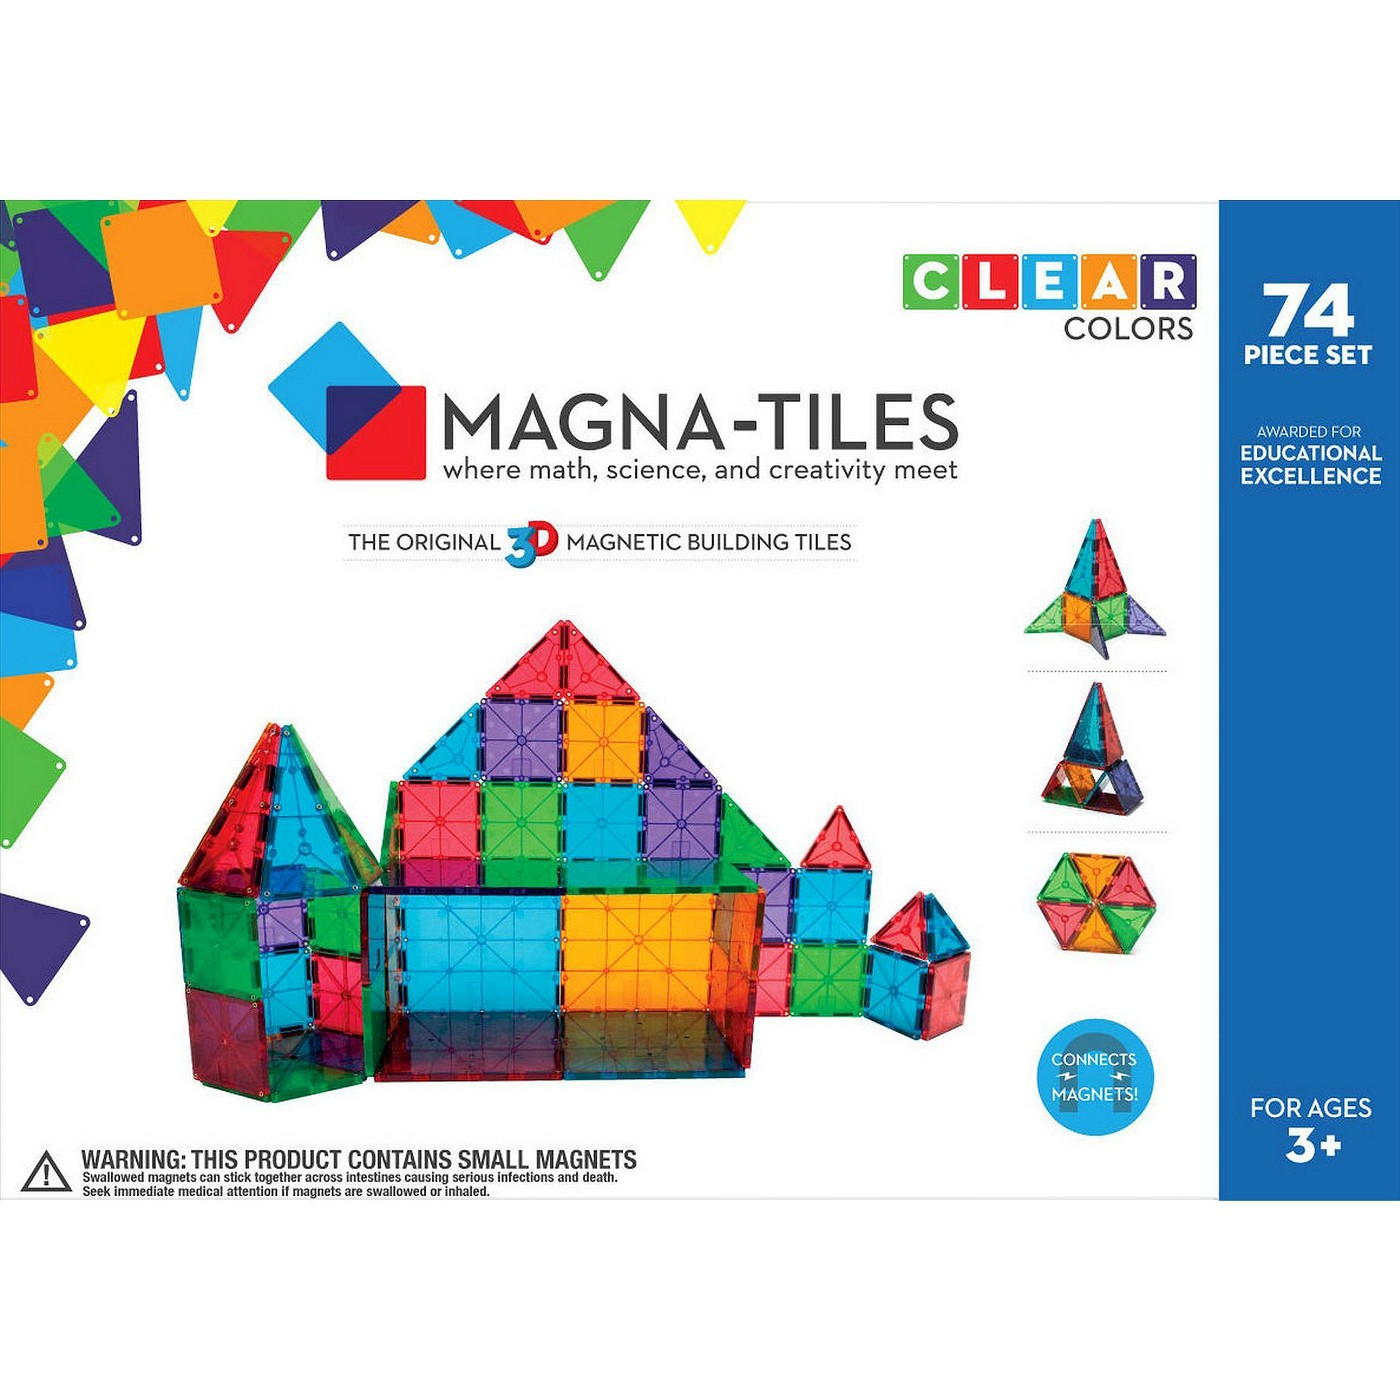 Valtech Magna-Tiles Clear Colors 74 Piece Set - image 1 of 7